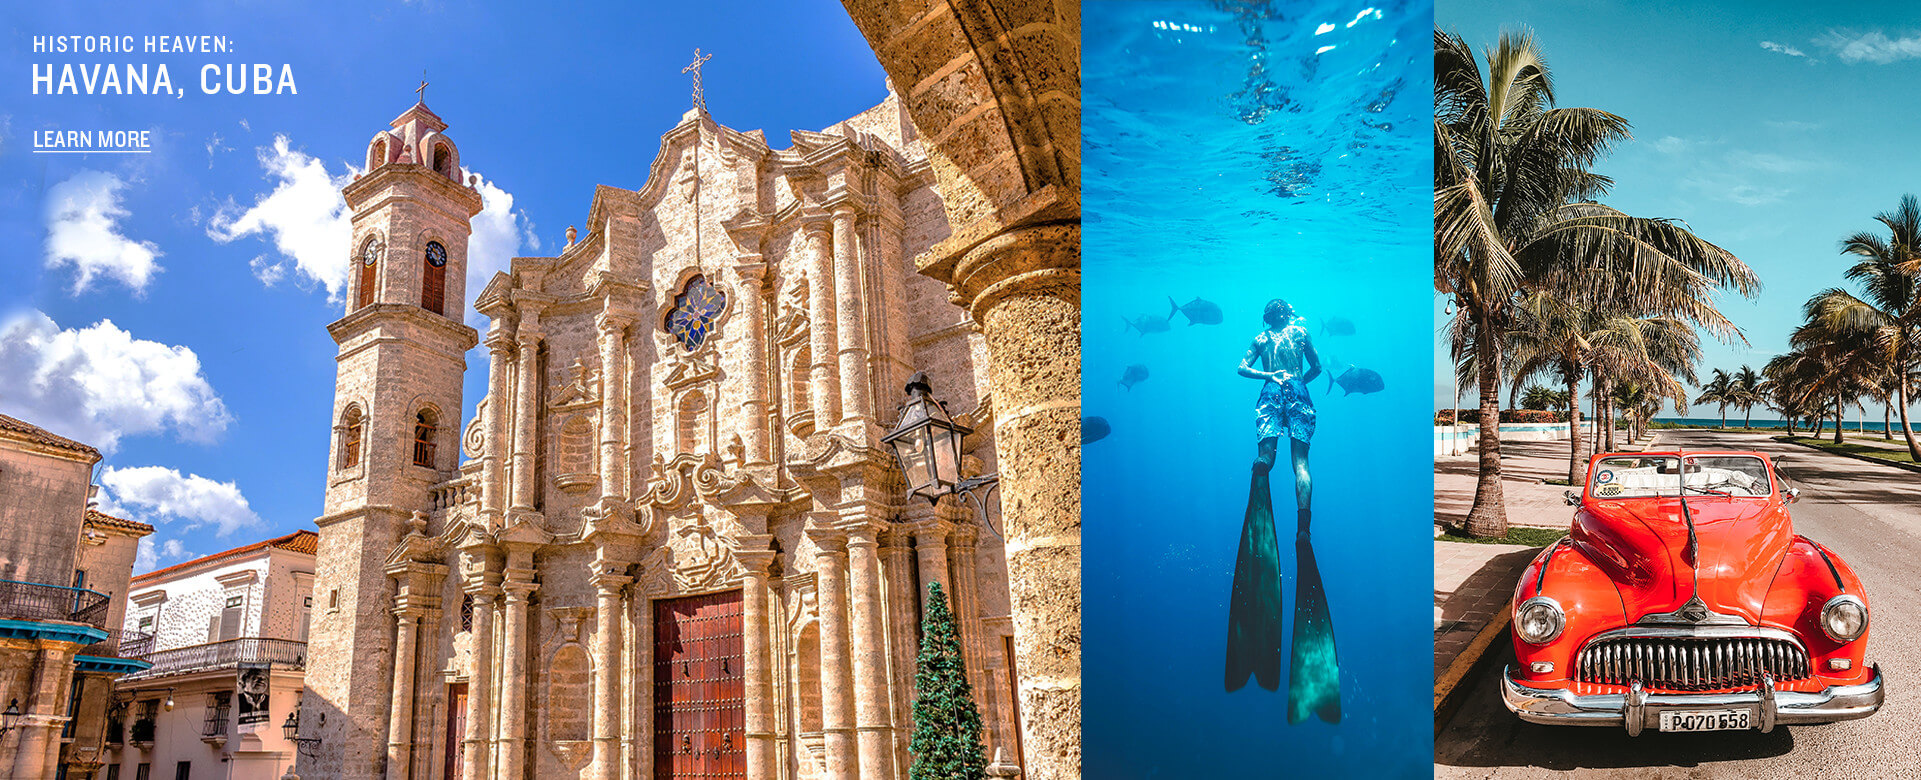 Historic Heaven: Havana, Cuba